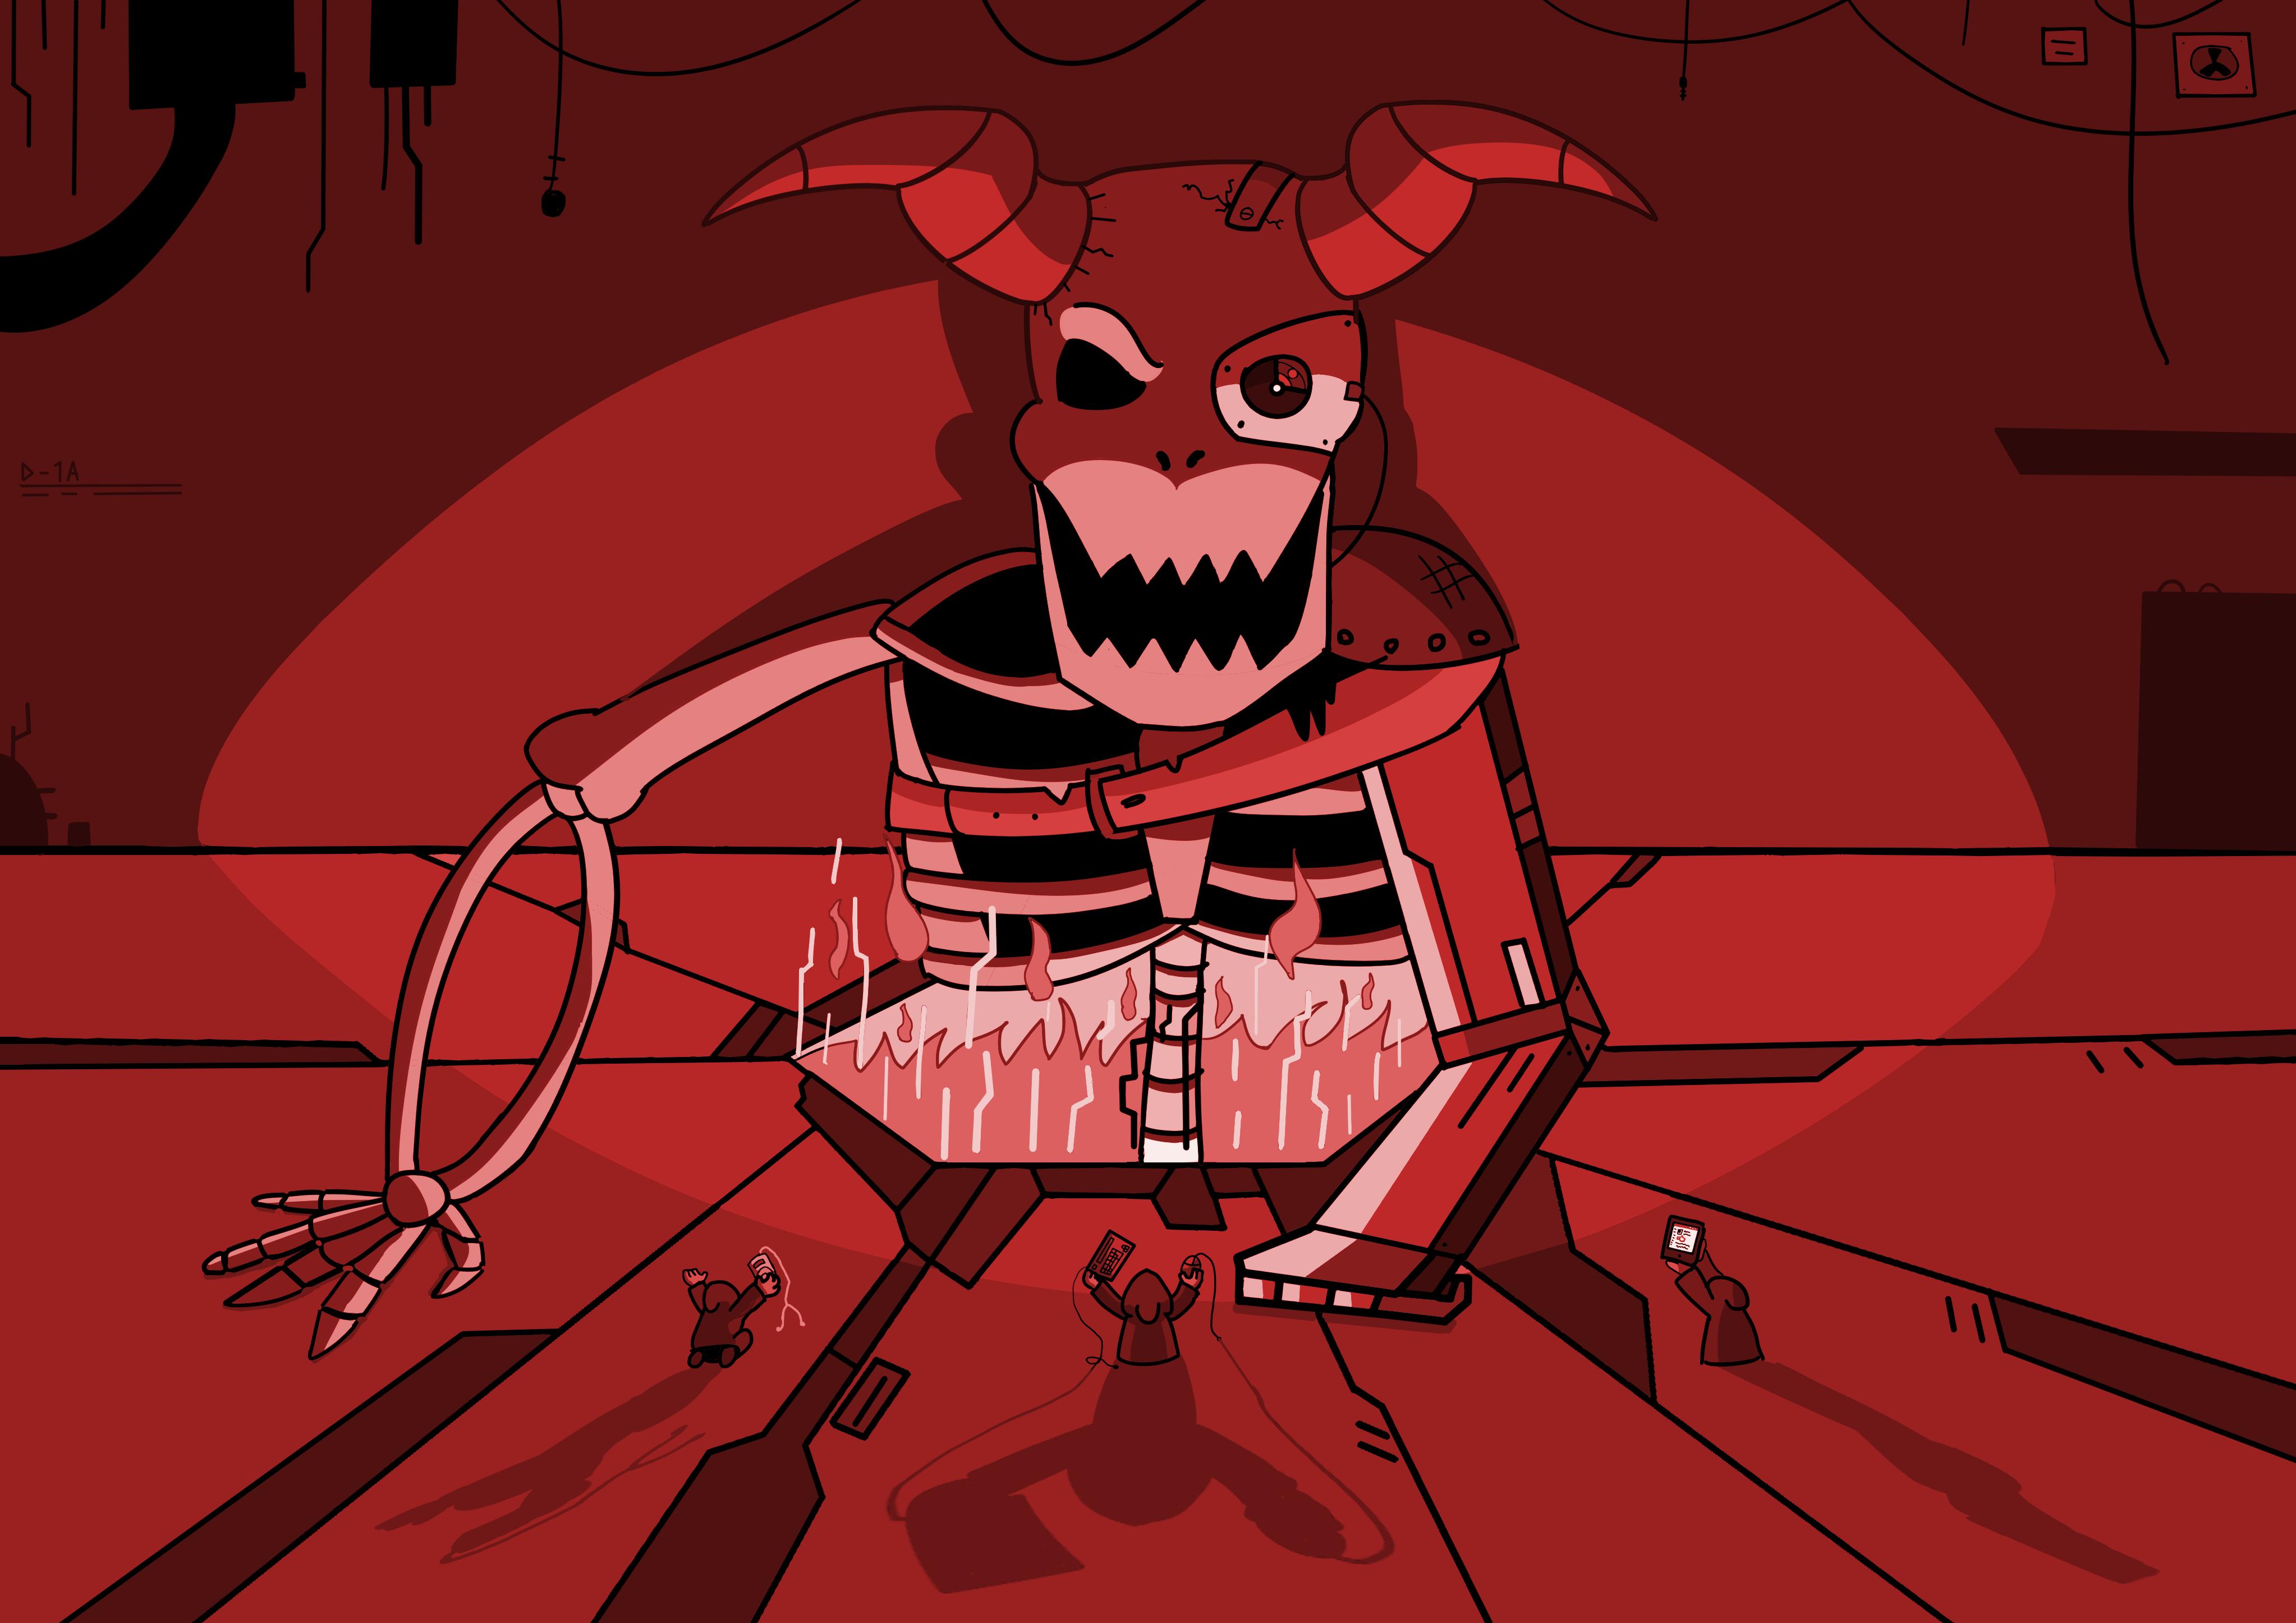 Demon by Littlenorwegians